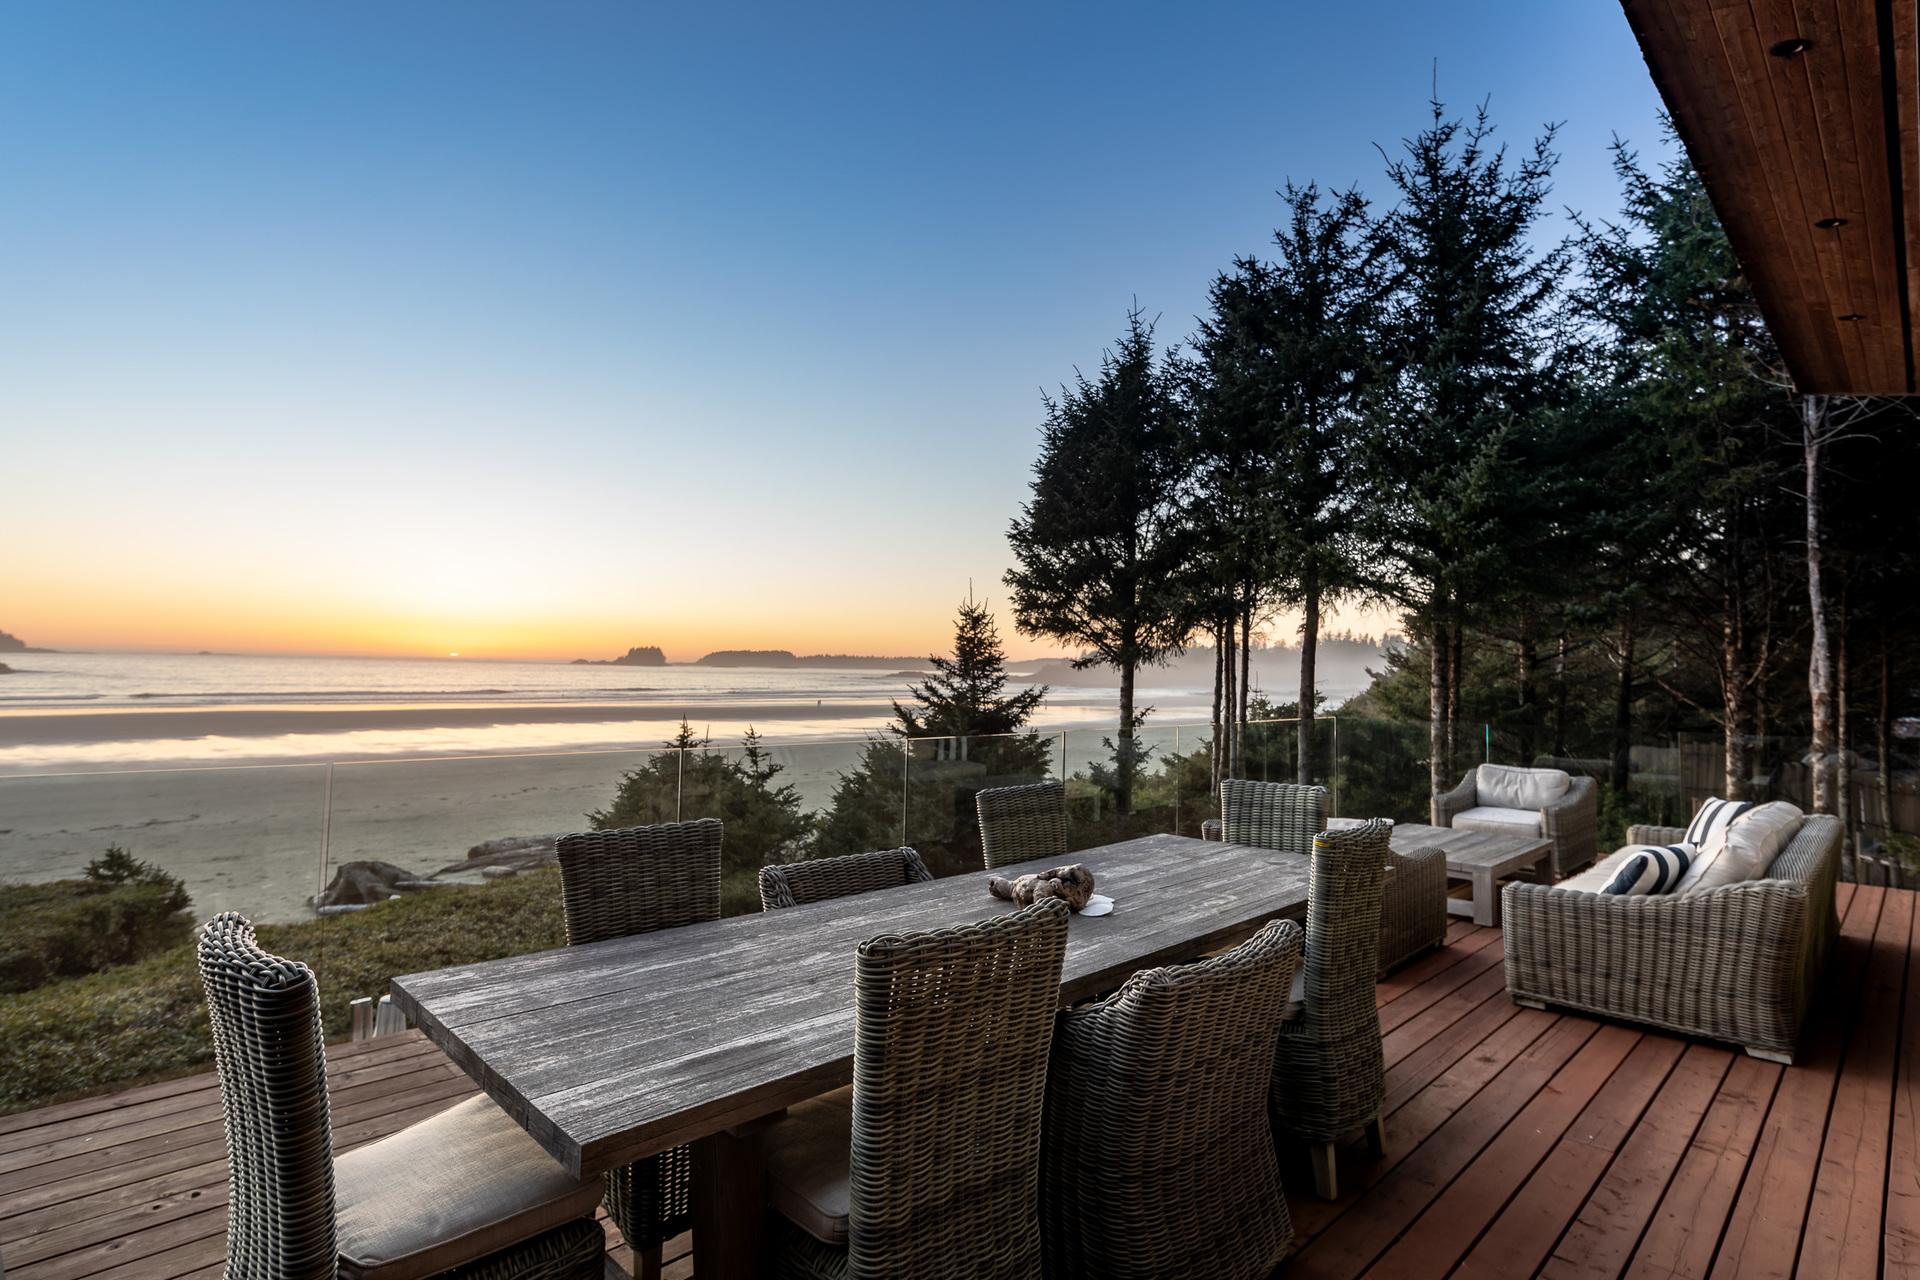 Chesterman Beach From The Upper Balcony at 1277 & 1281 Lynn Road, Tofino Tofino, Vancouver Island